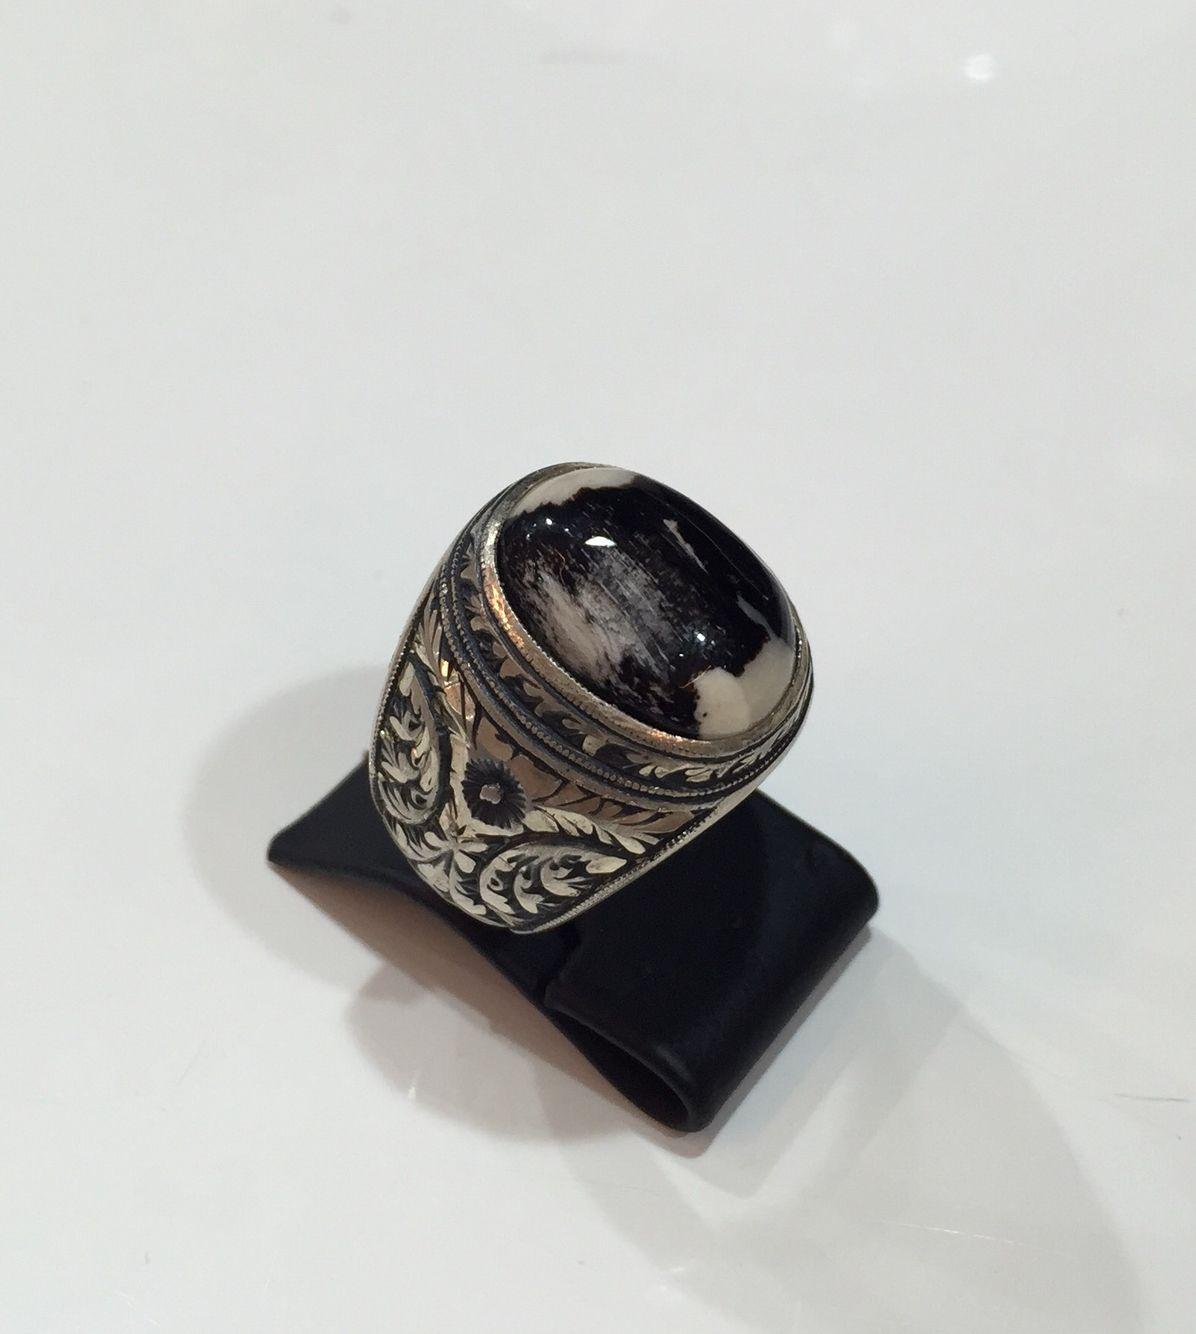 Petrified wood agate handmade 925 silver men ring